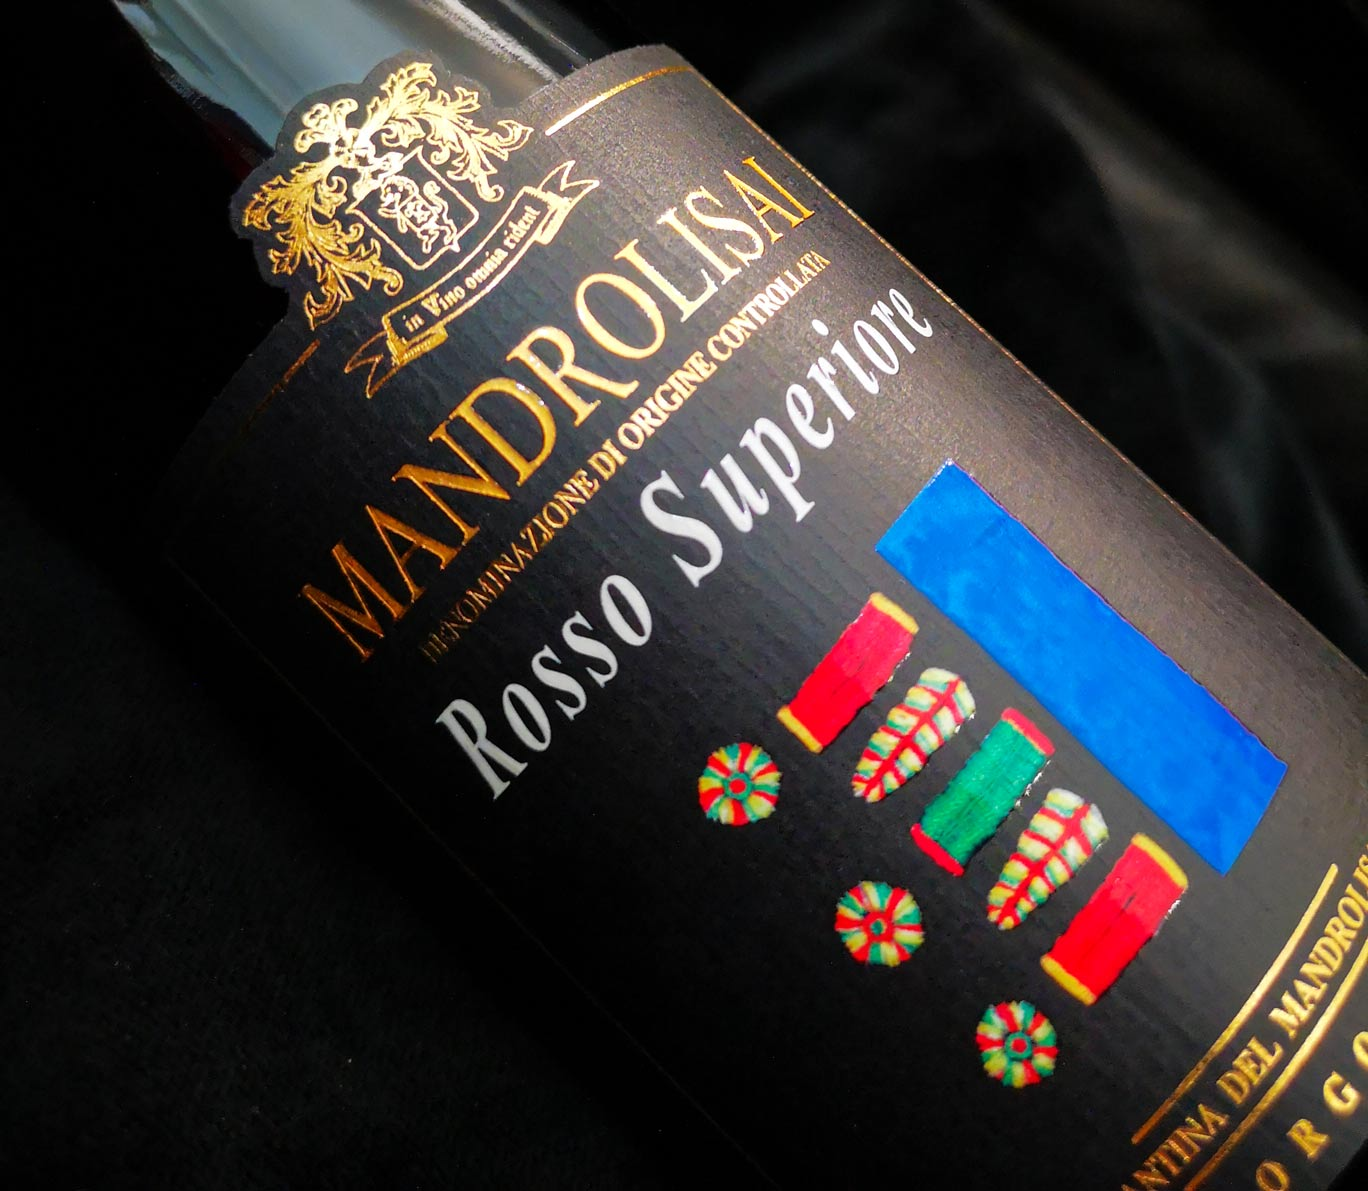 Mandrolisai rosso Superiore - Vino rosso di Sardegna